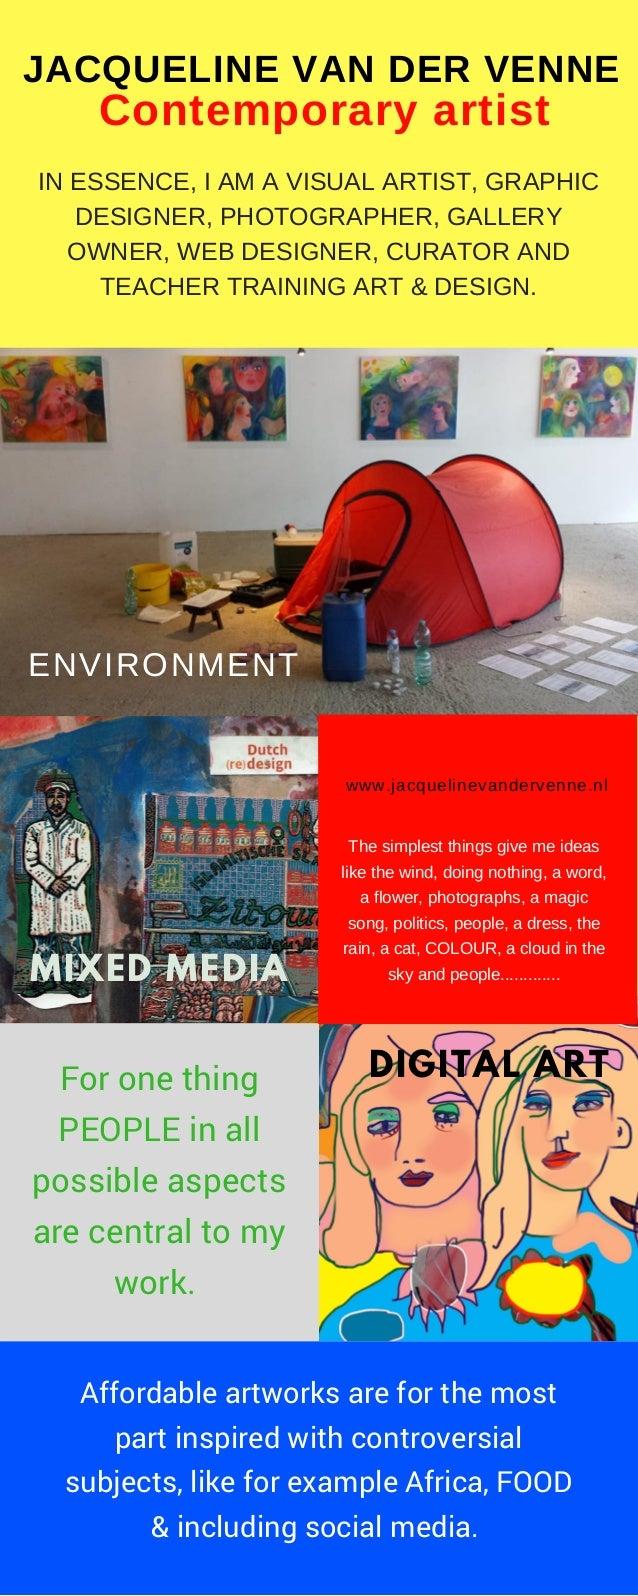 IN ESSENCE, I AM A VISUAL ARTIST, GRAPHIC DESIGNER, PHOTOGRAPHER, GALLERY OWNER, WEB DESIGNER, CURATOR AND TEACHER TRAININ...